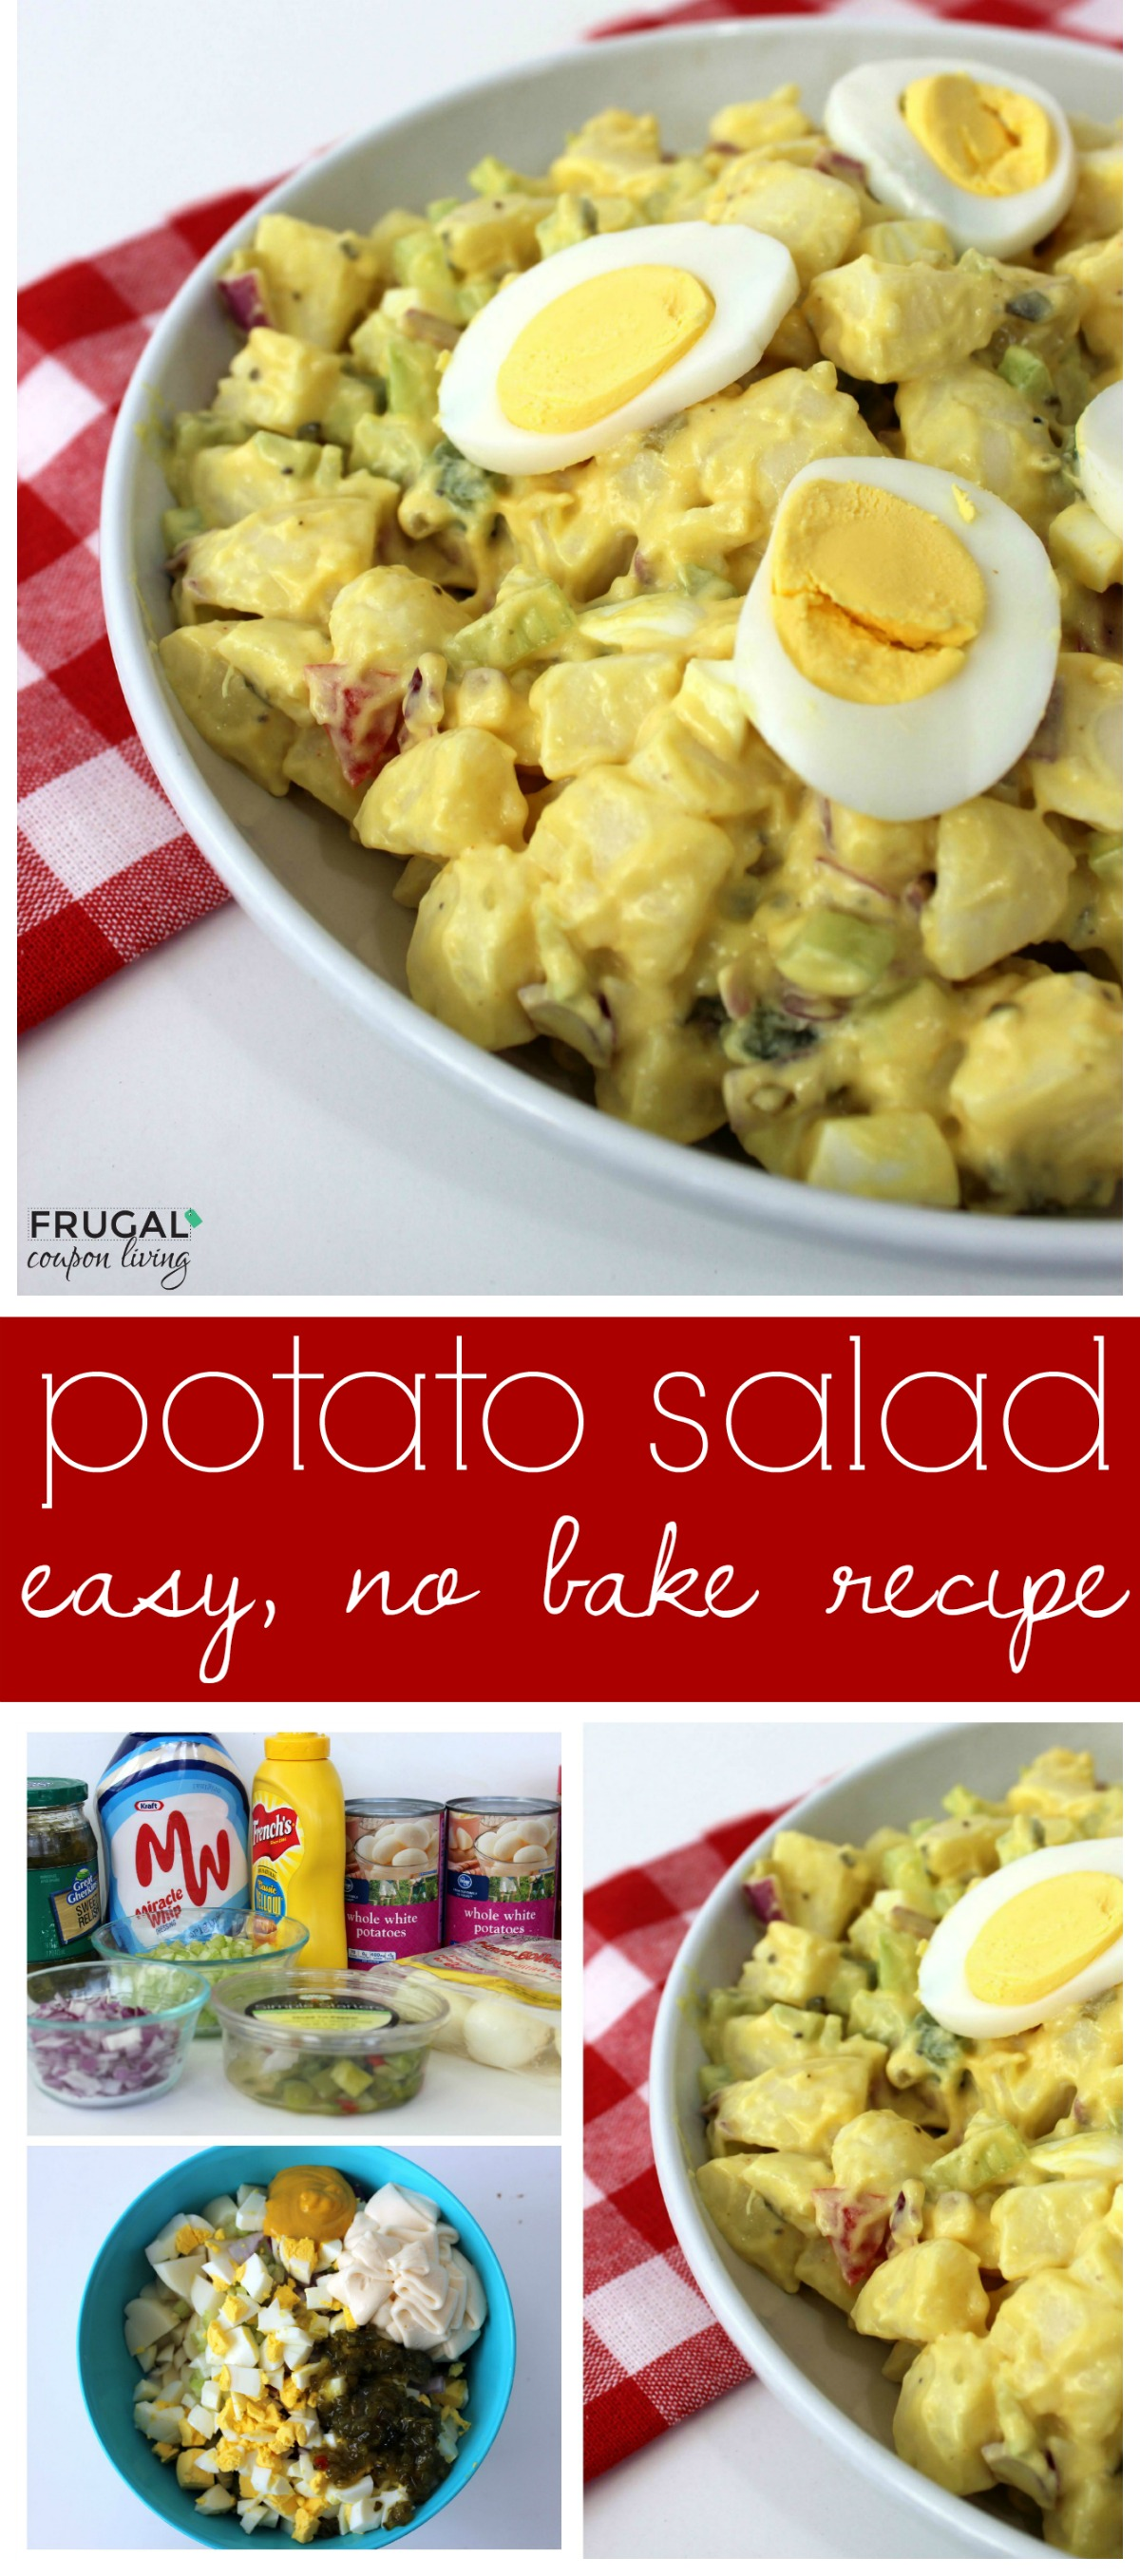 easy-no-bake-potato-salad-recipe-Collage